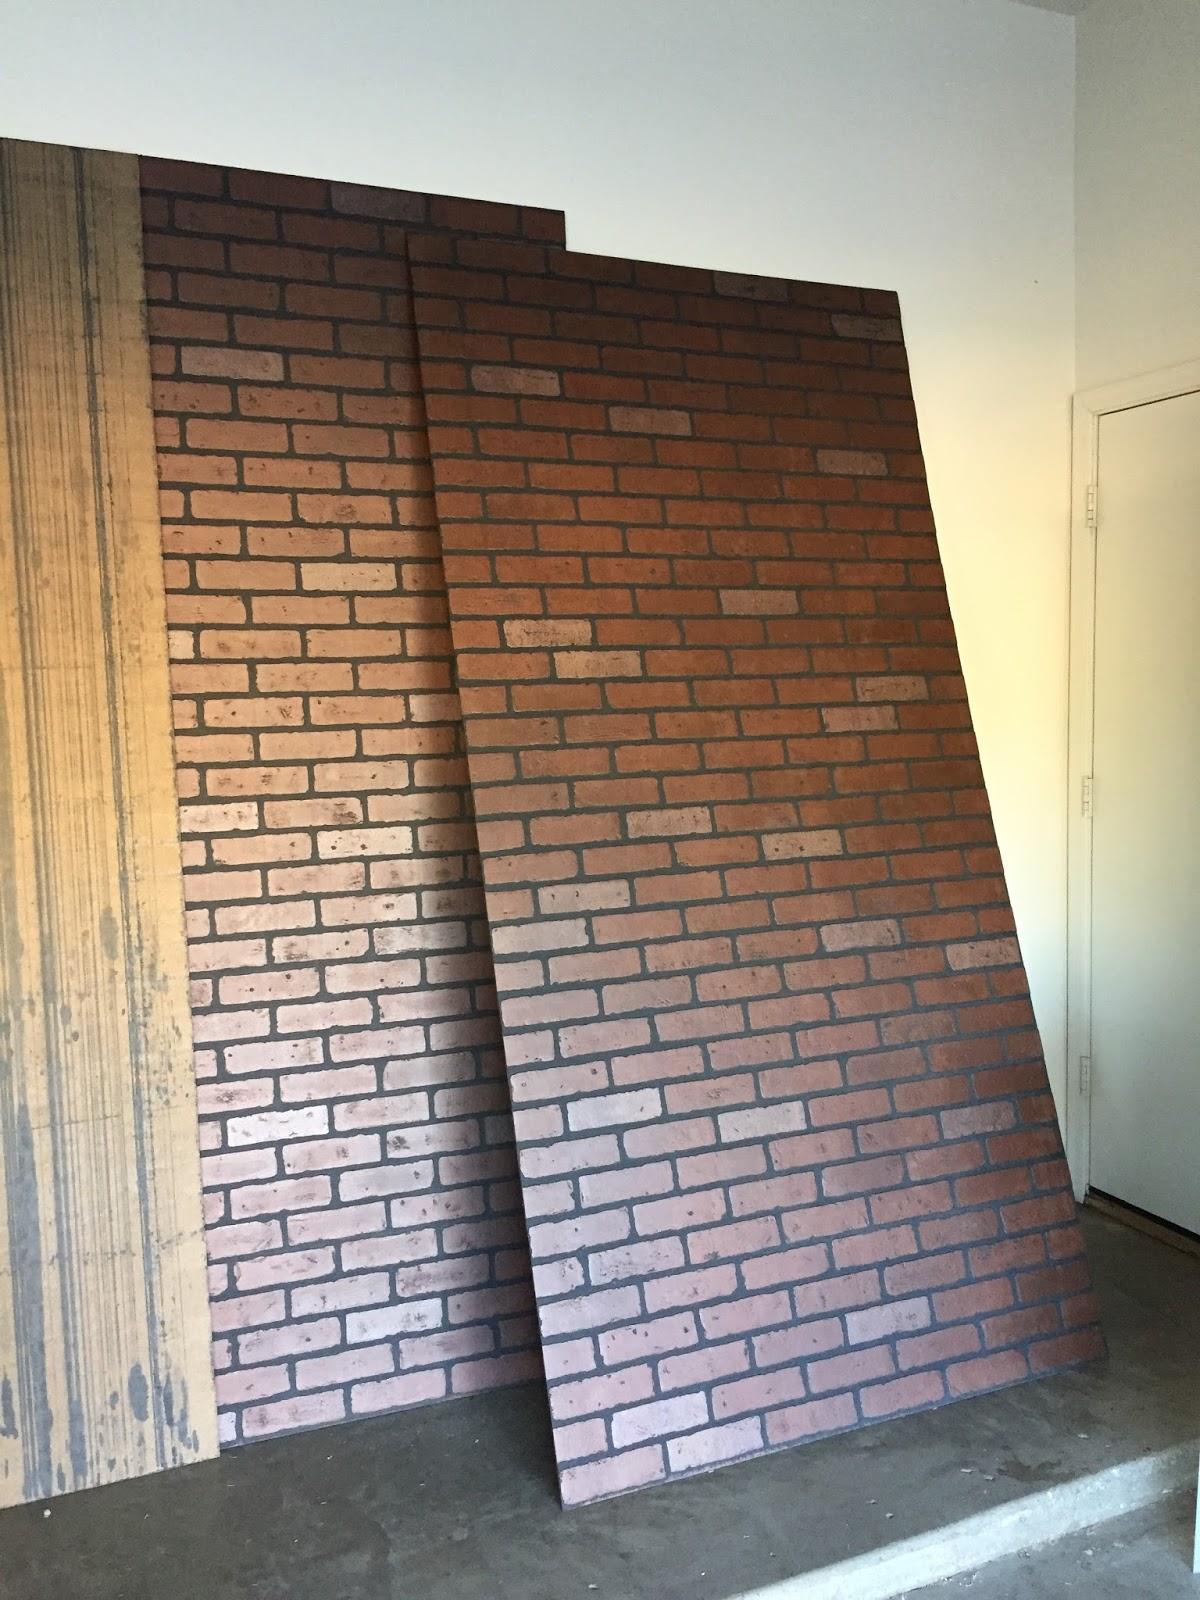 Faux Brick Panels Home Depot Freckles in april diy faux brick 1200x1600